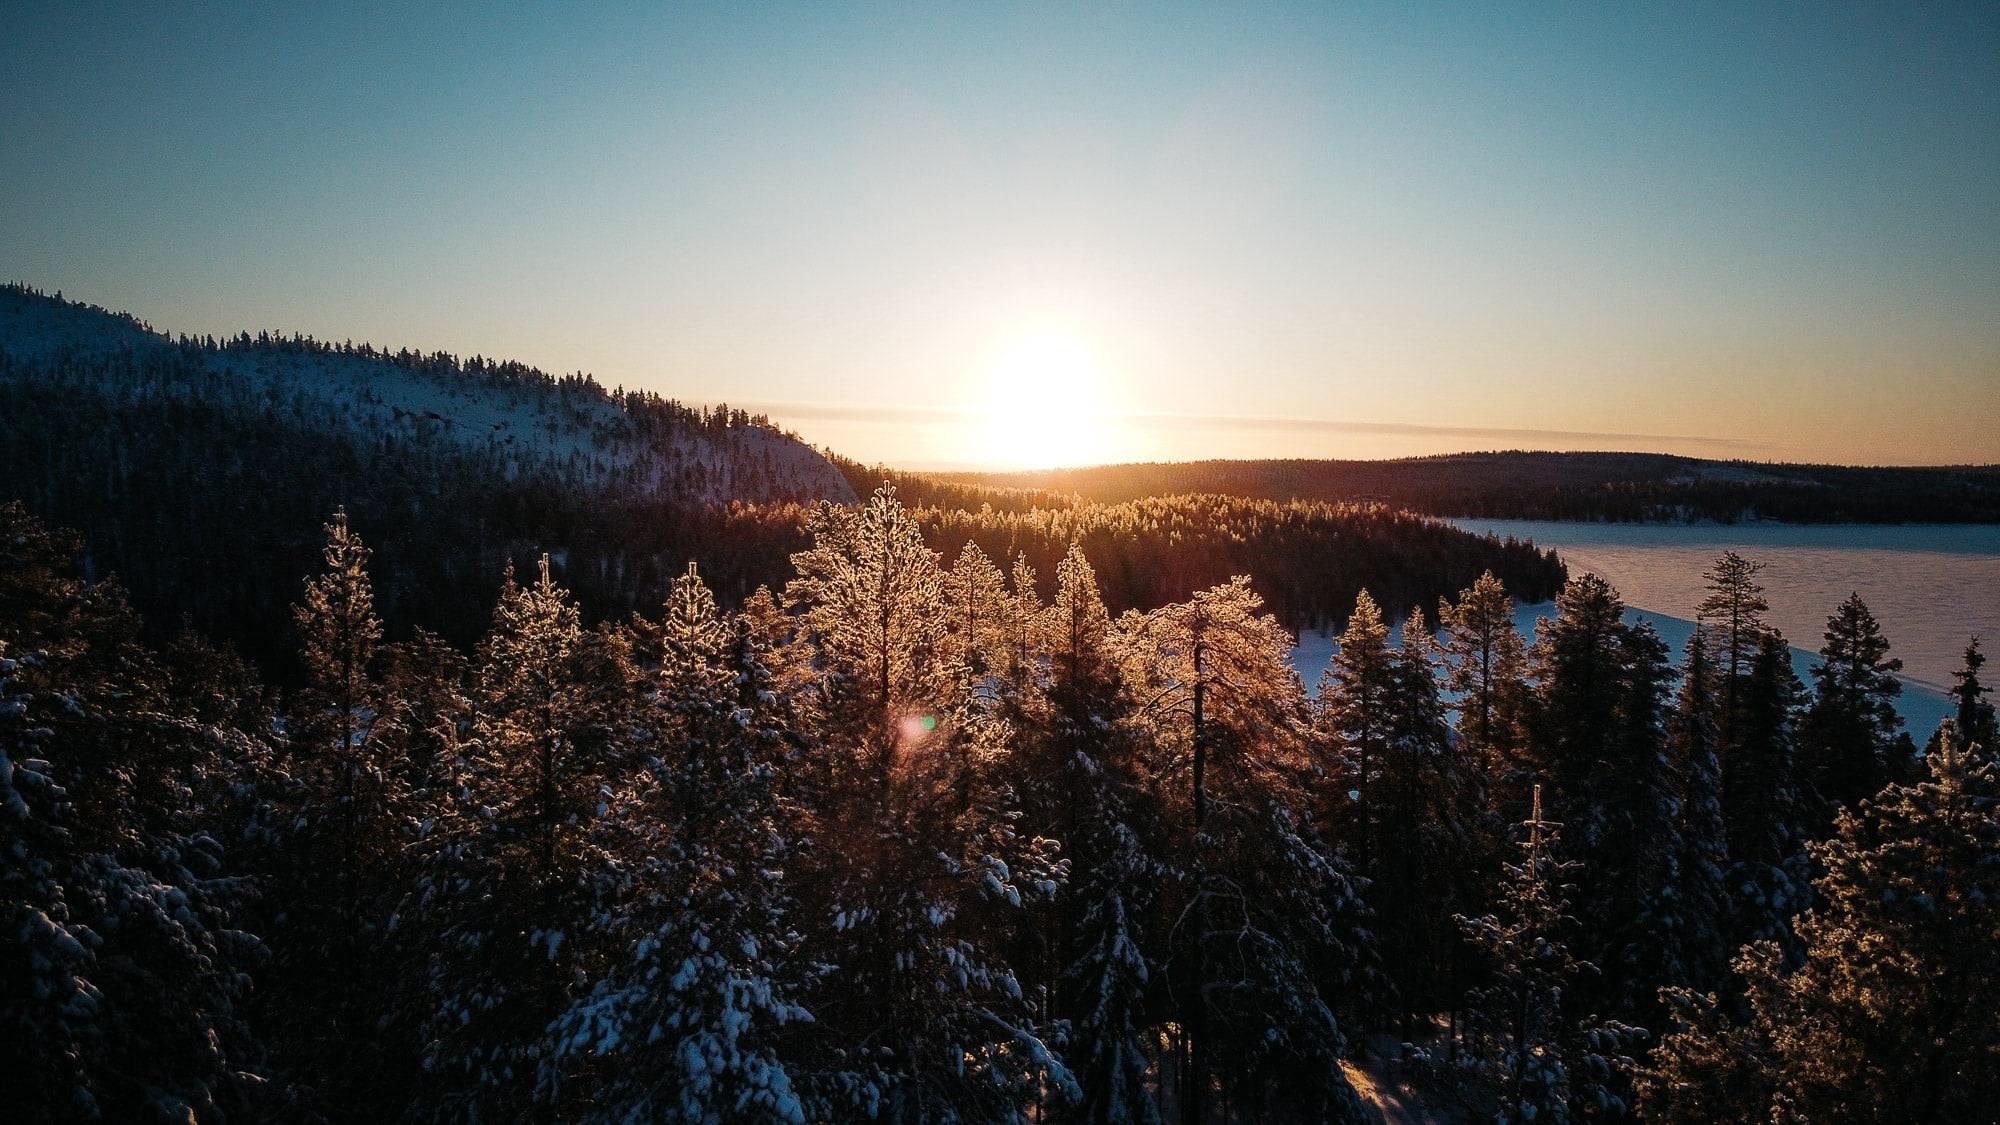 waltsmedia-drone-shot-finland-kuusamo-1